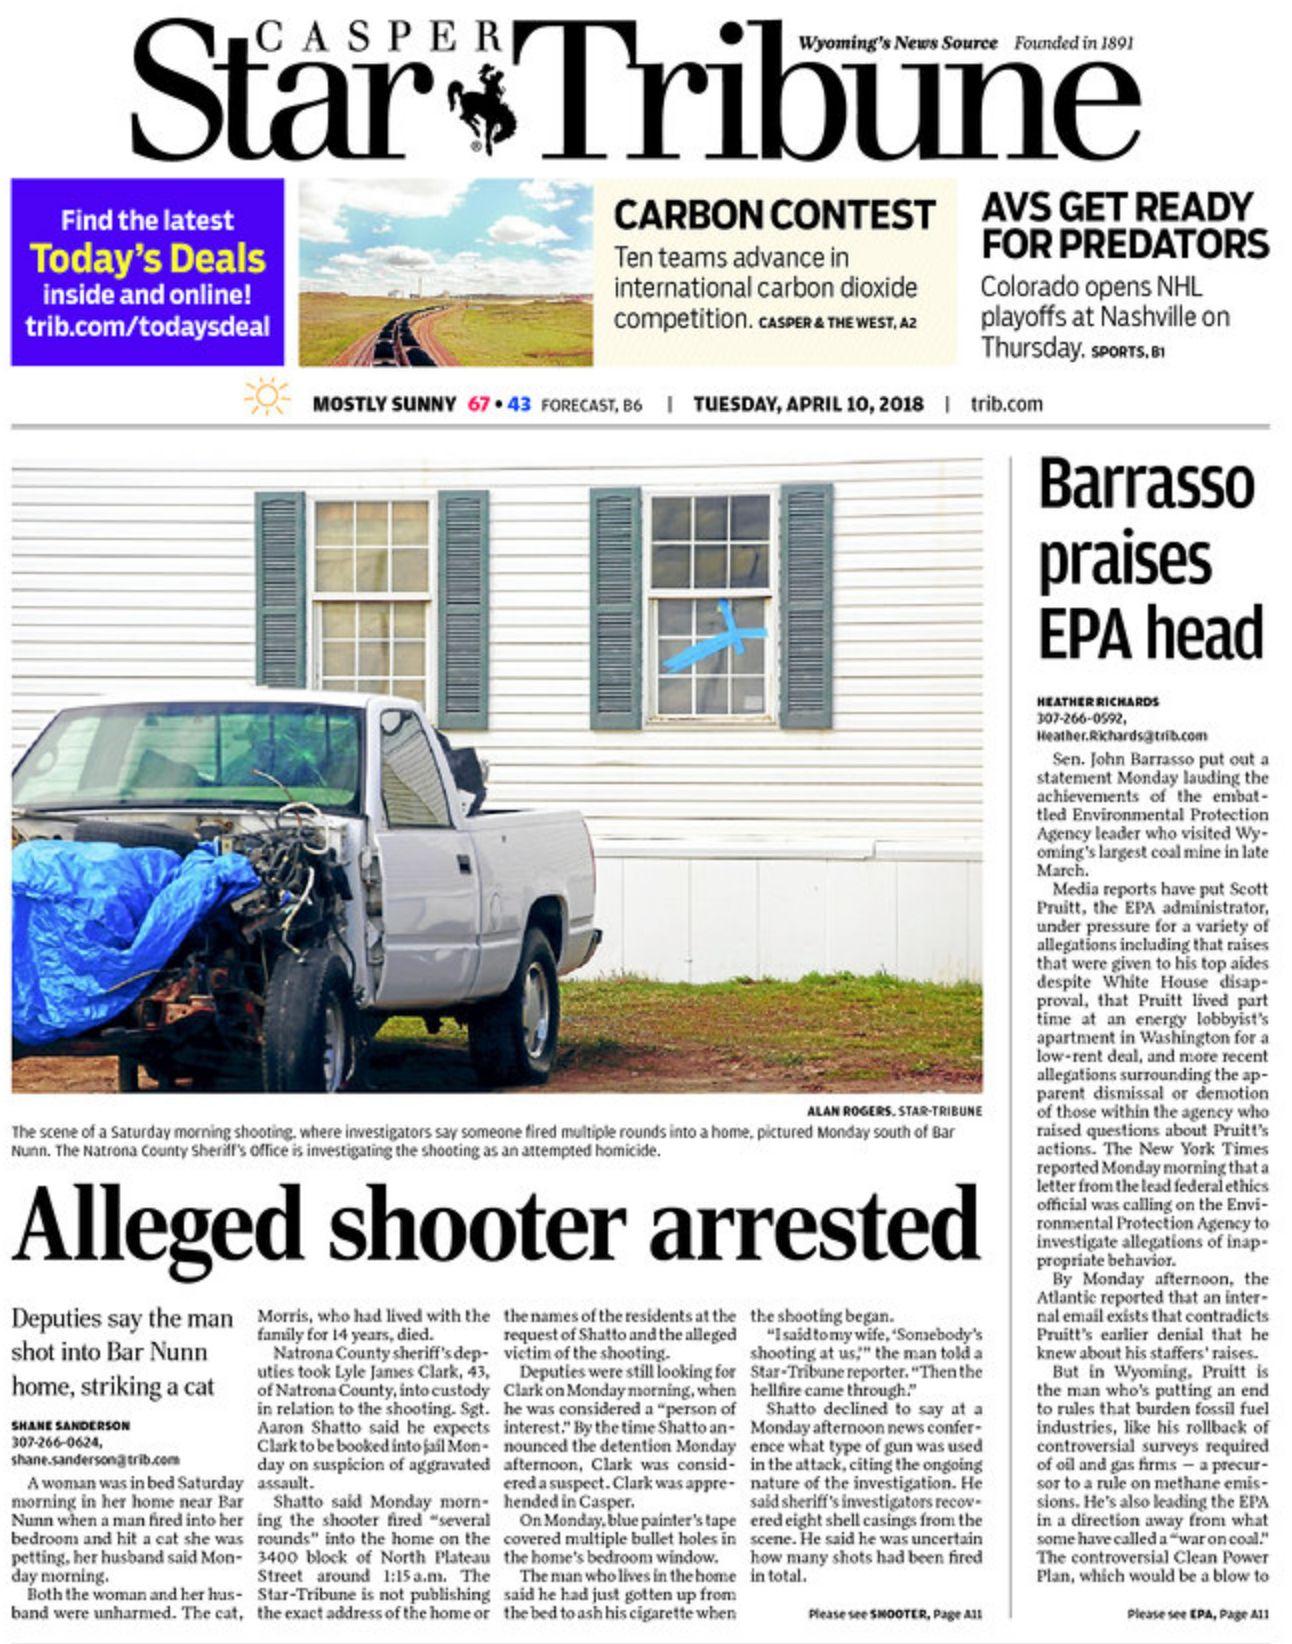 Casper Star-Tribune